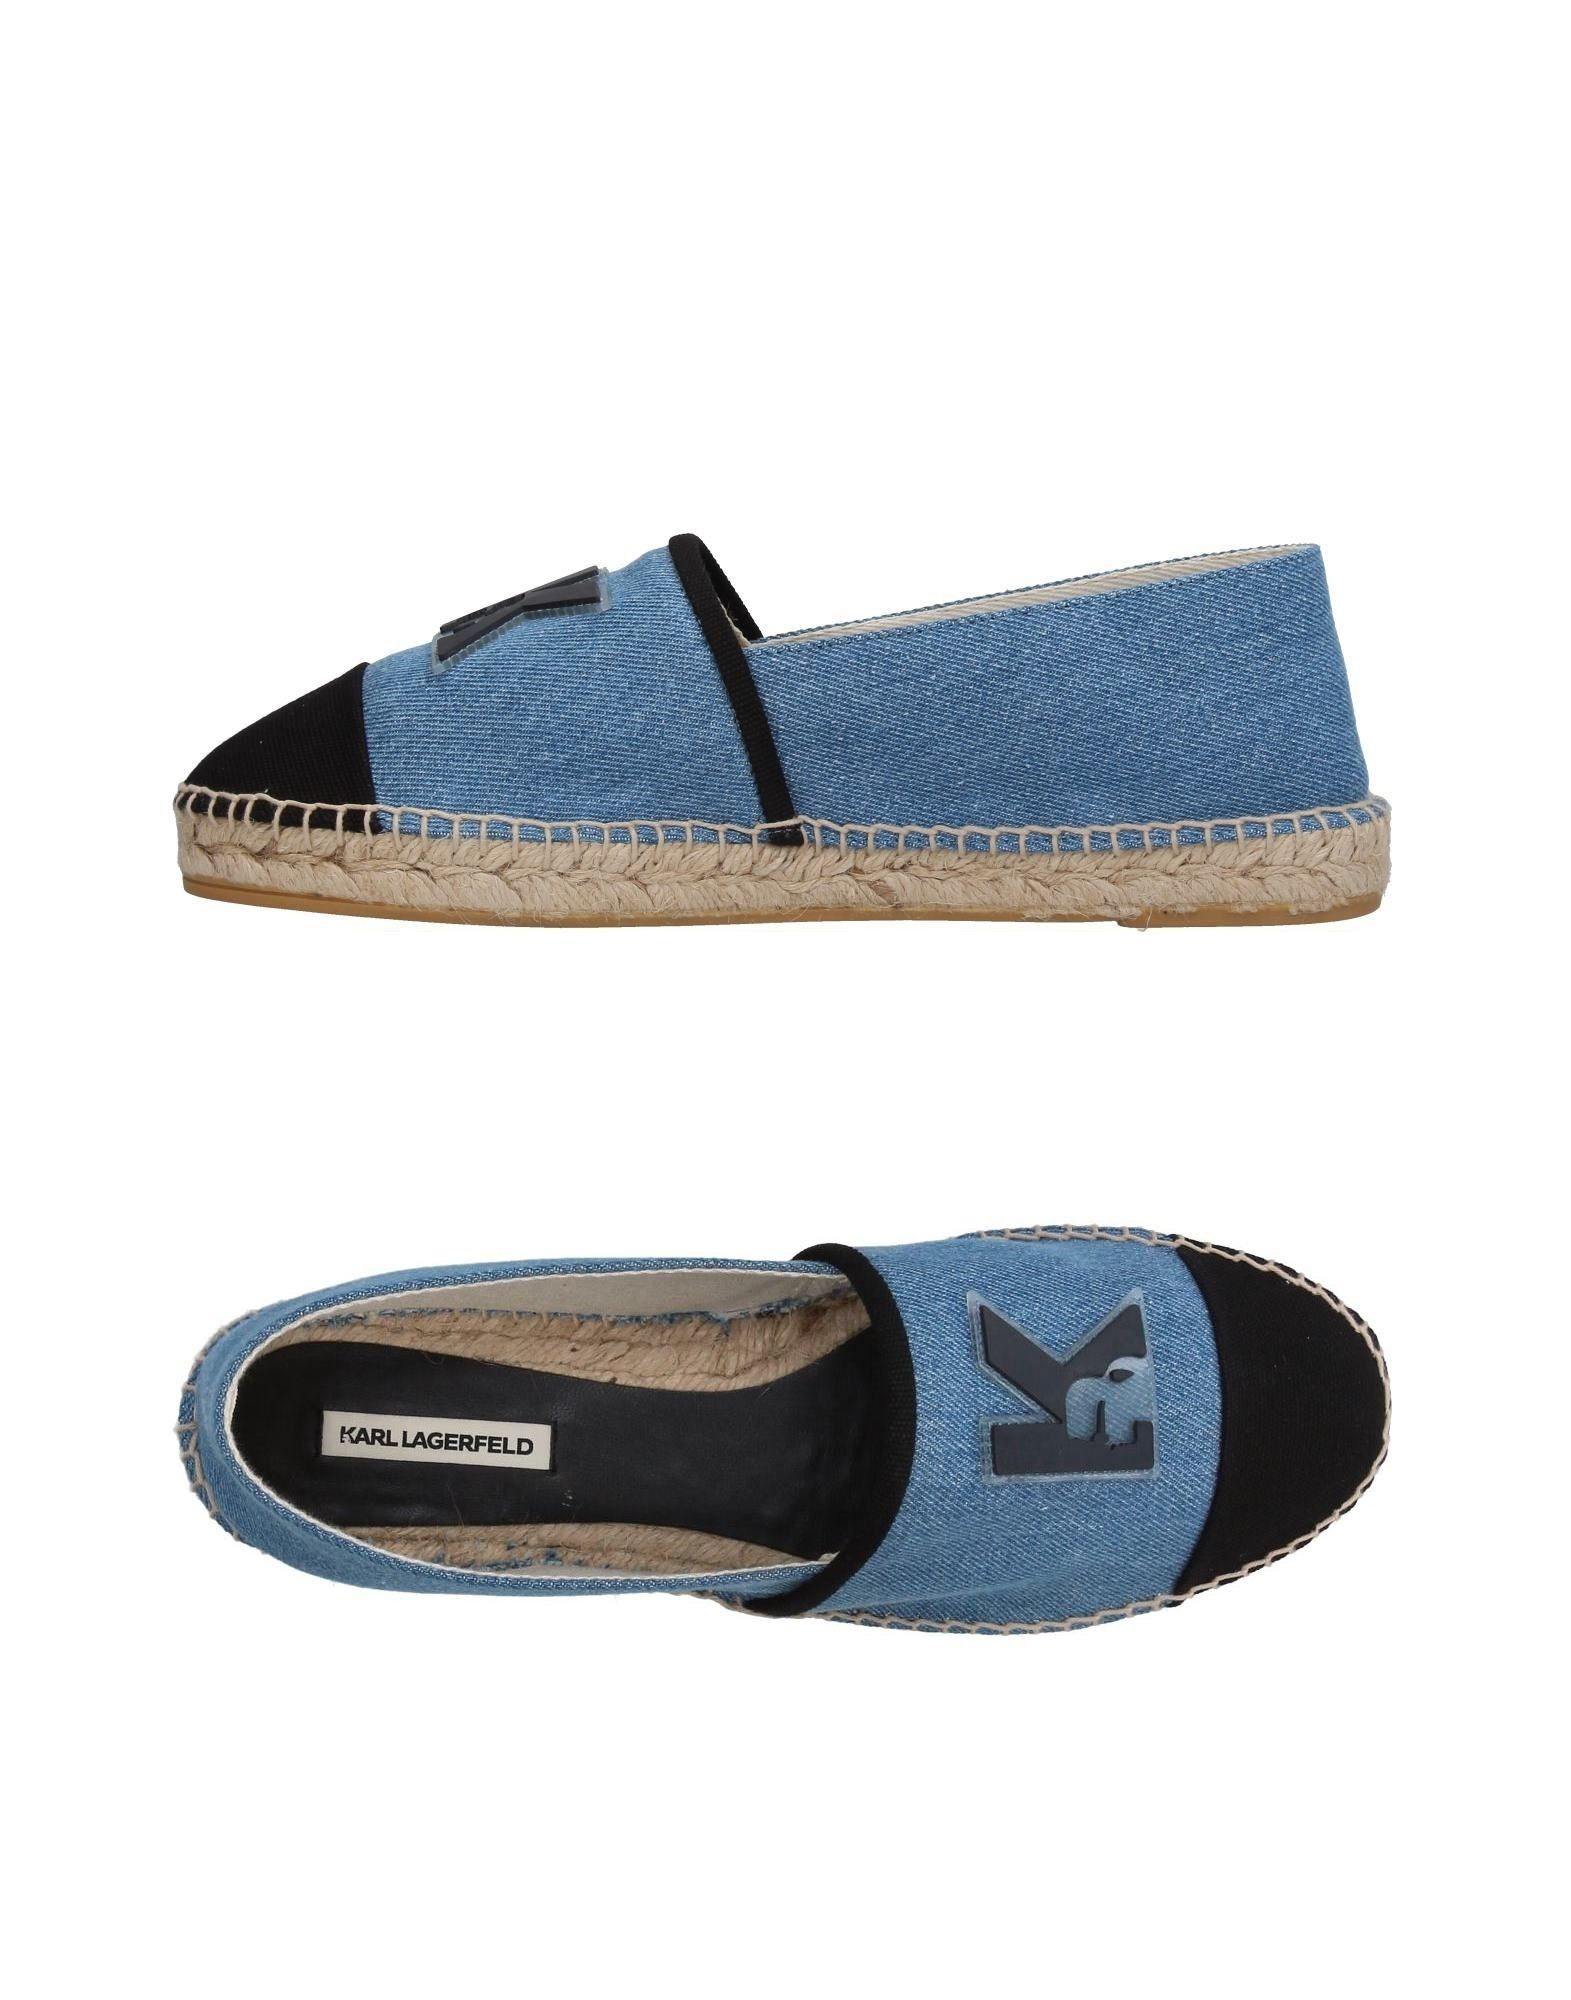 Karl Lagerfeld Espadrilles Damen  11373641TS Gute Qualität beliebte Schuhe